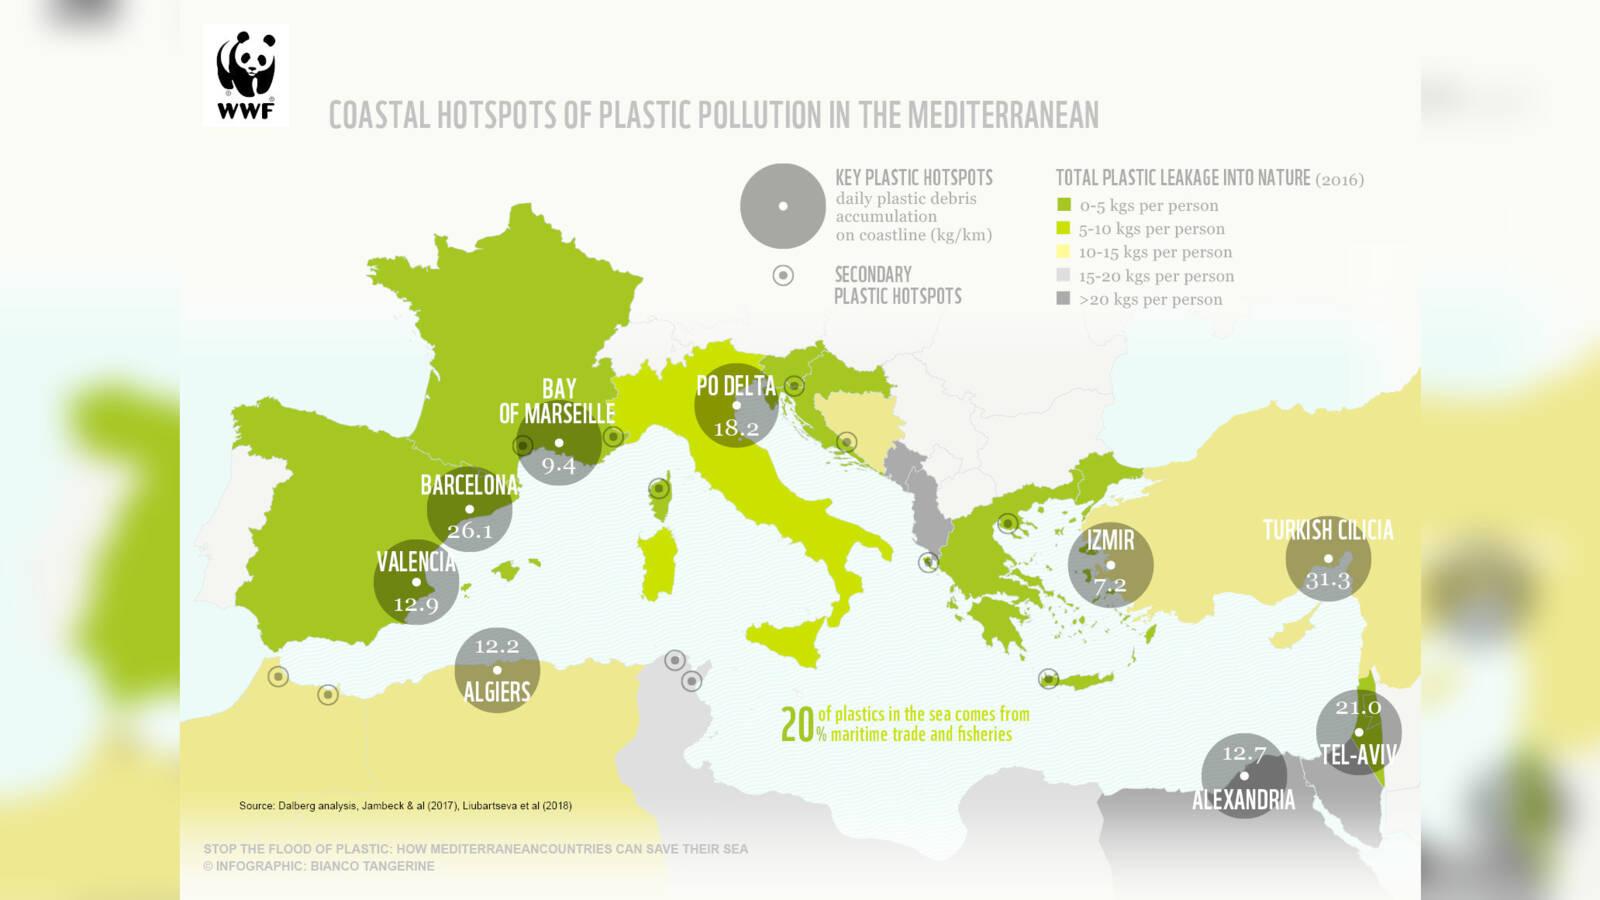 Plastic pollution in the Mediterranean